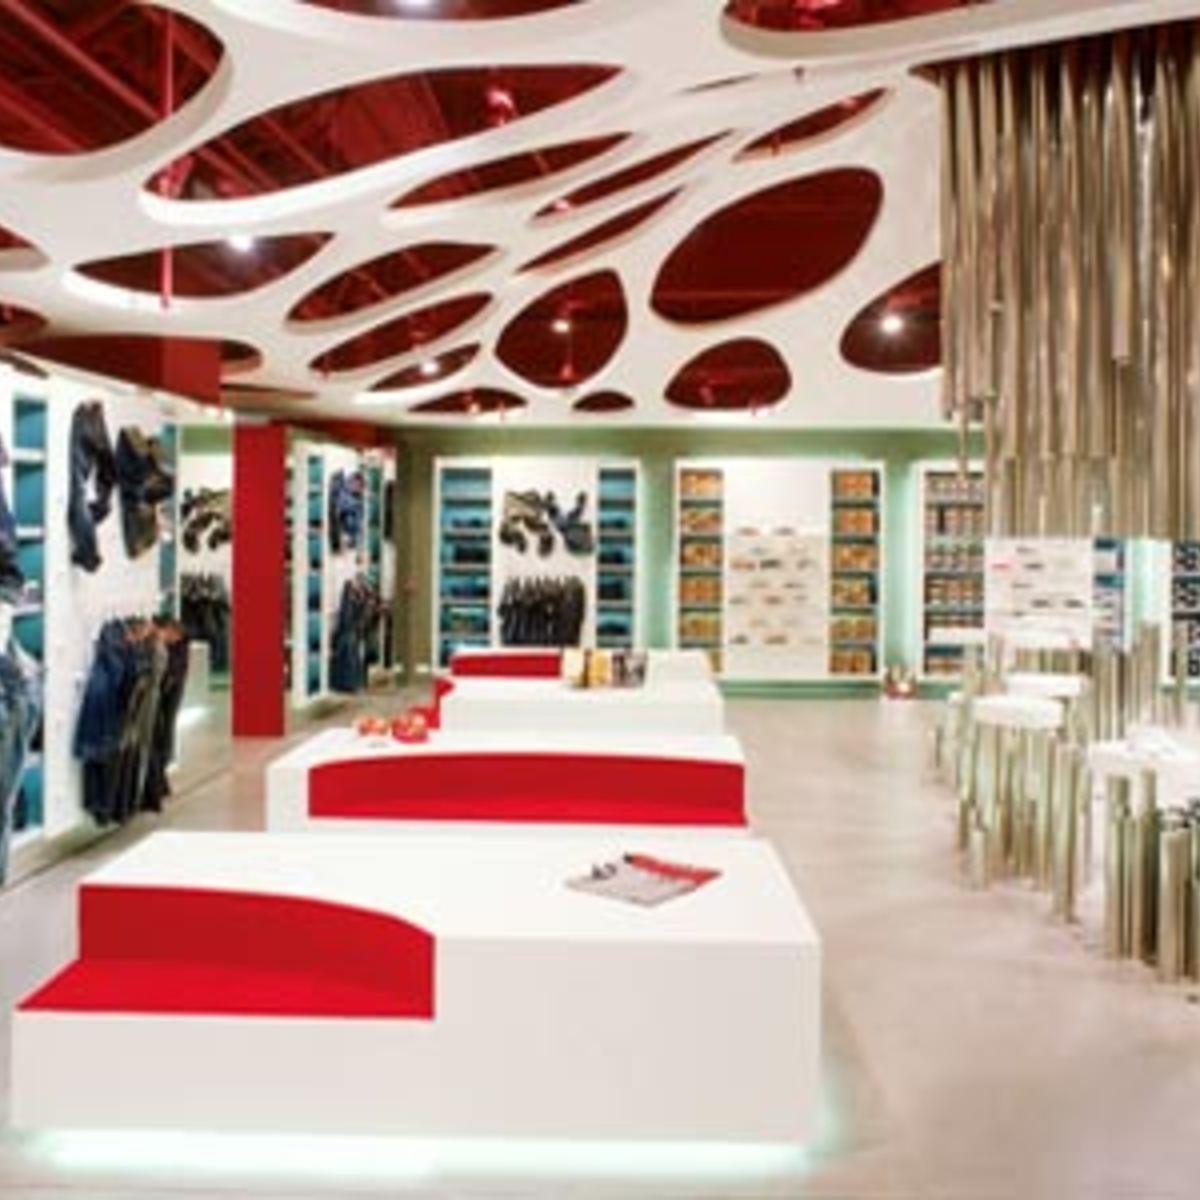 Novo - Studio 63 Architecture + Design<br />Hong Kong, 2007